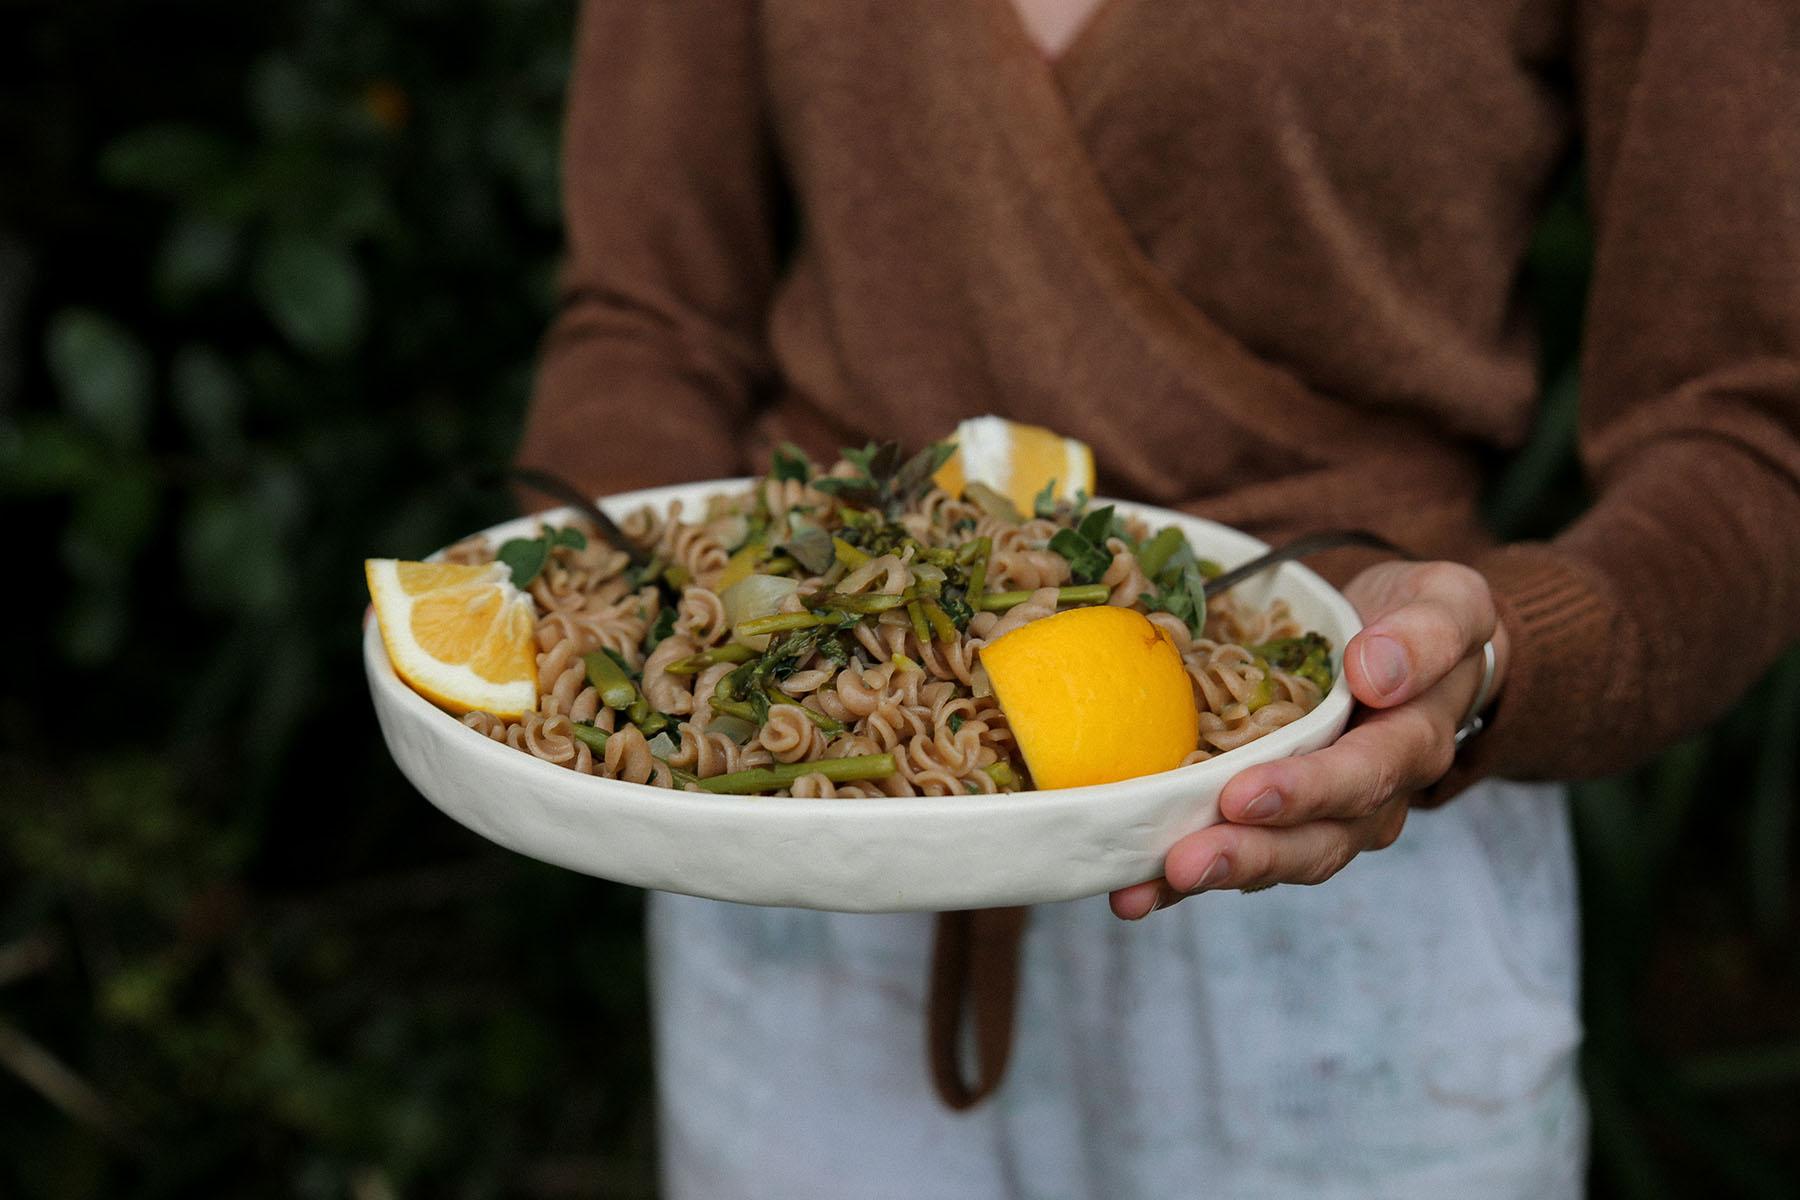 Petite Kitchenu0027s One Pot Pasta With Asparagus, Lemon And Basil Recipe   Viva